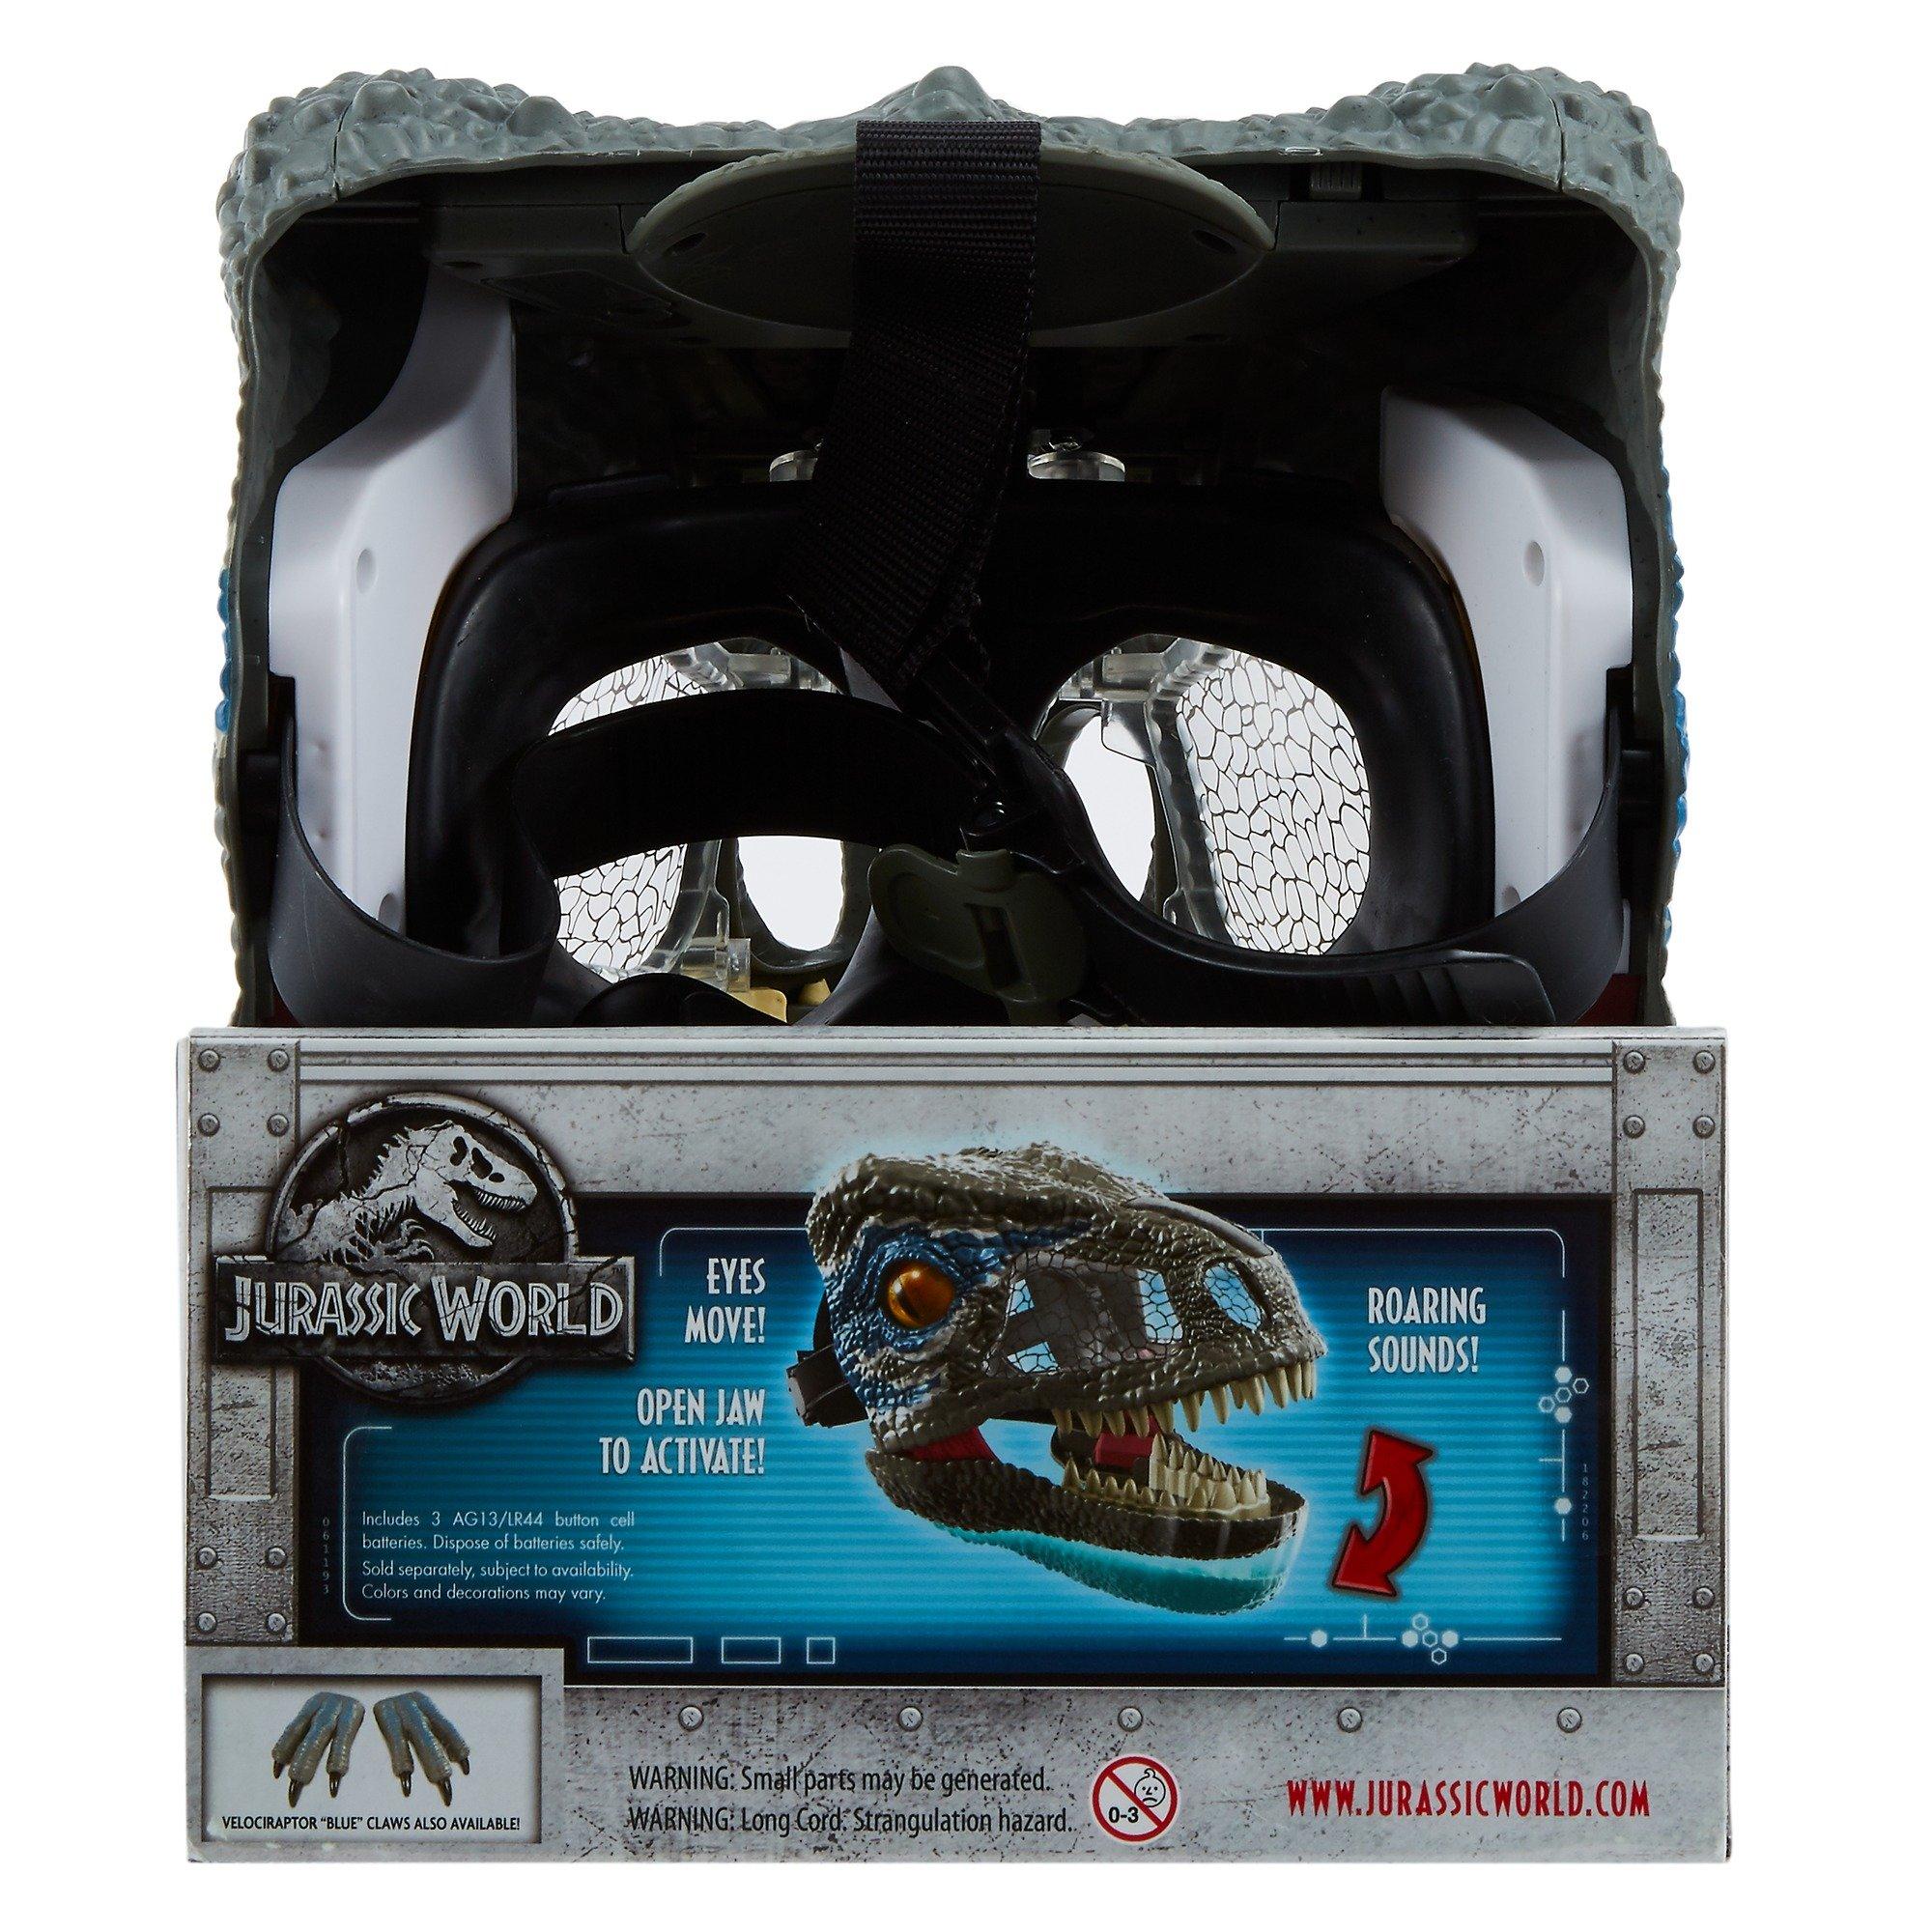 Jurassic World Chomp 'n Roar Mask Velociraptor ''blue'' by Jurassic World Toys (Image #10)